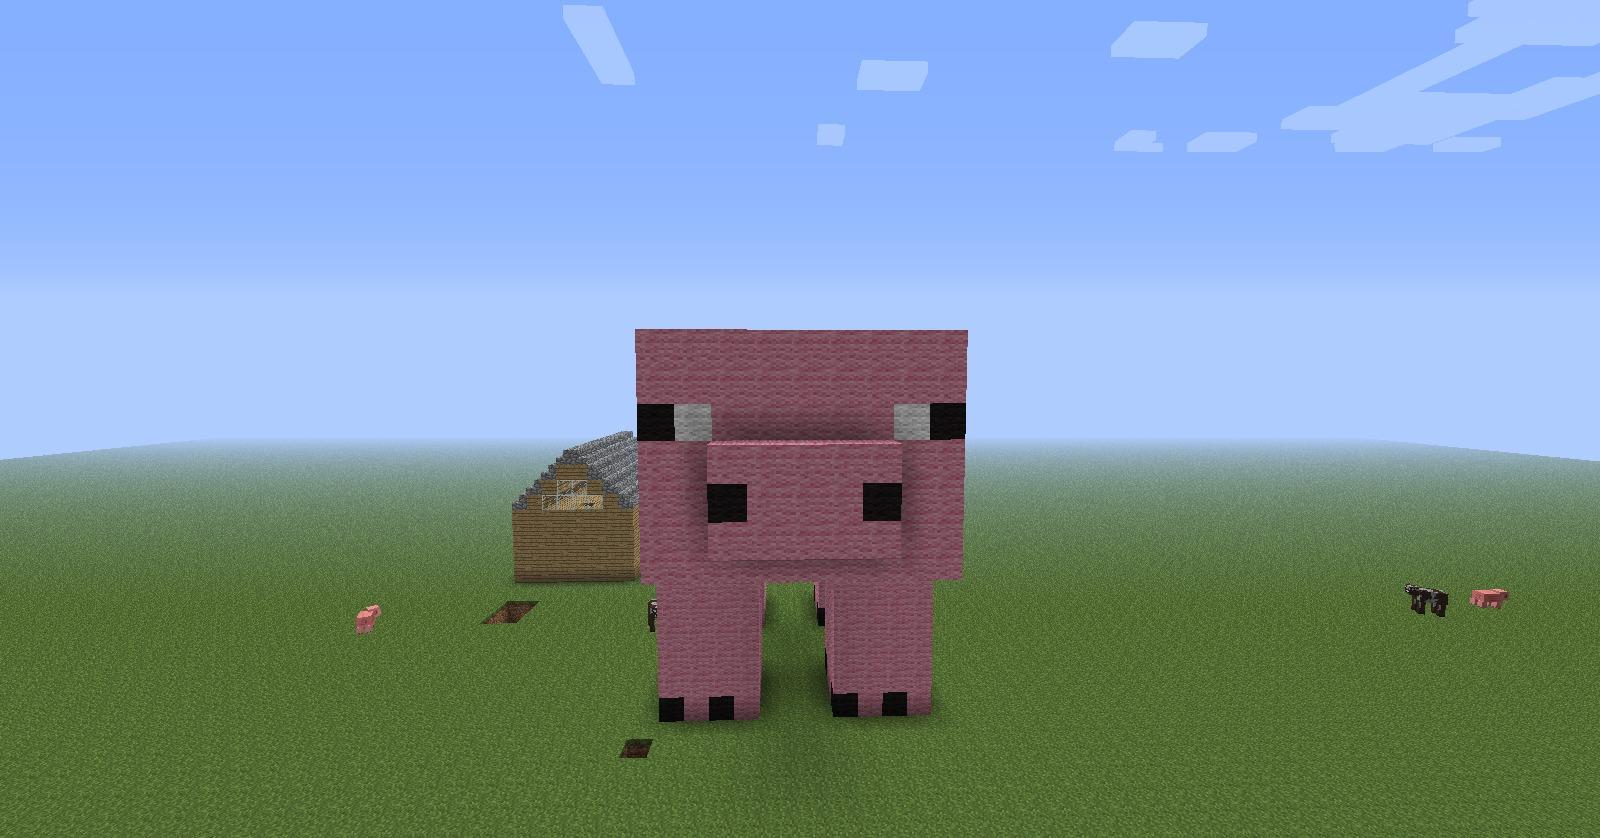 minecraft how to make a pig